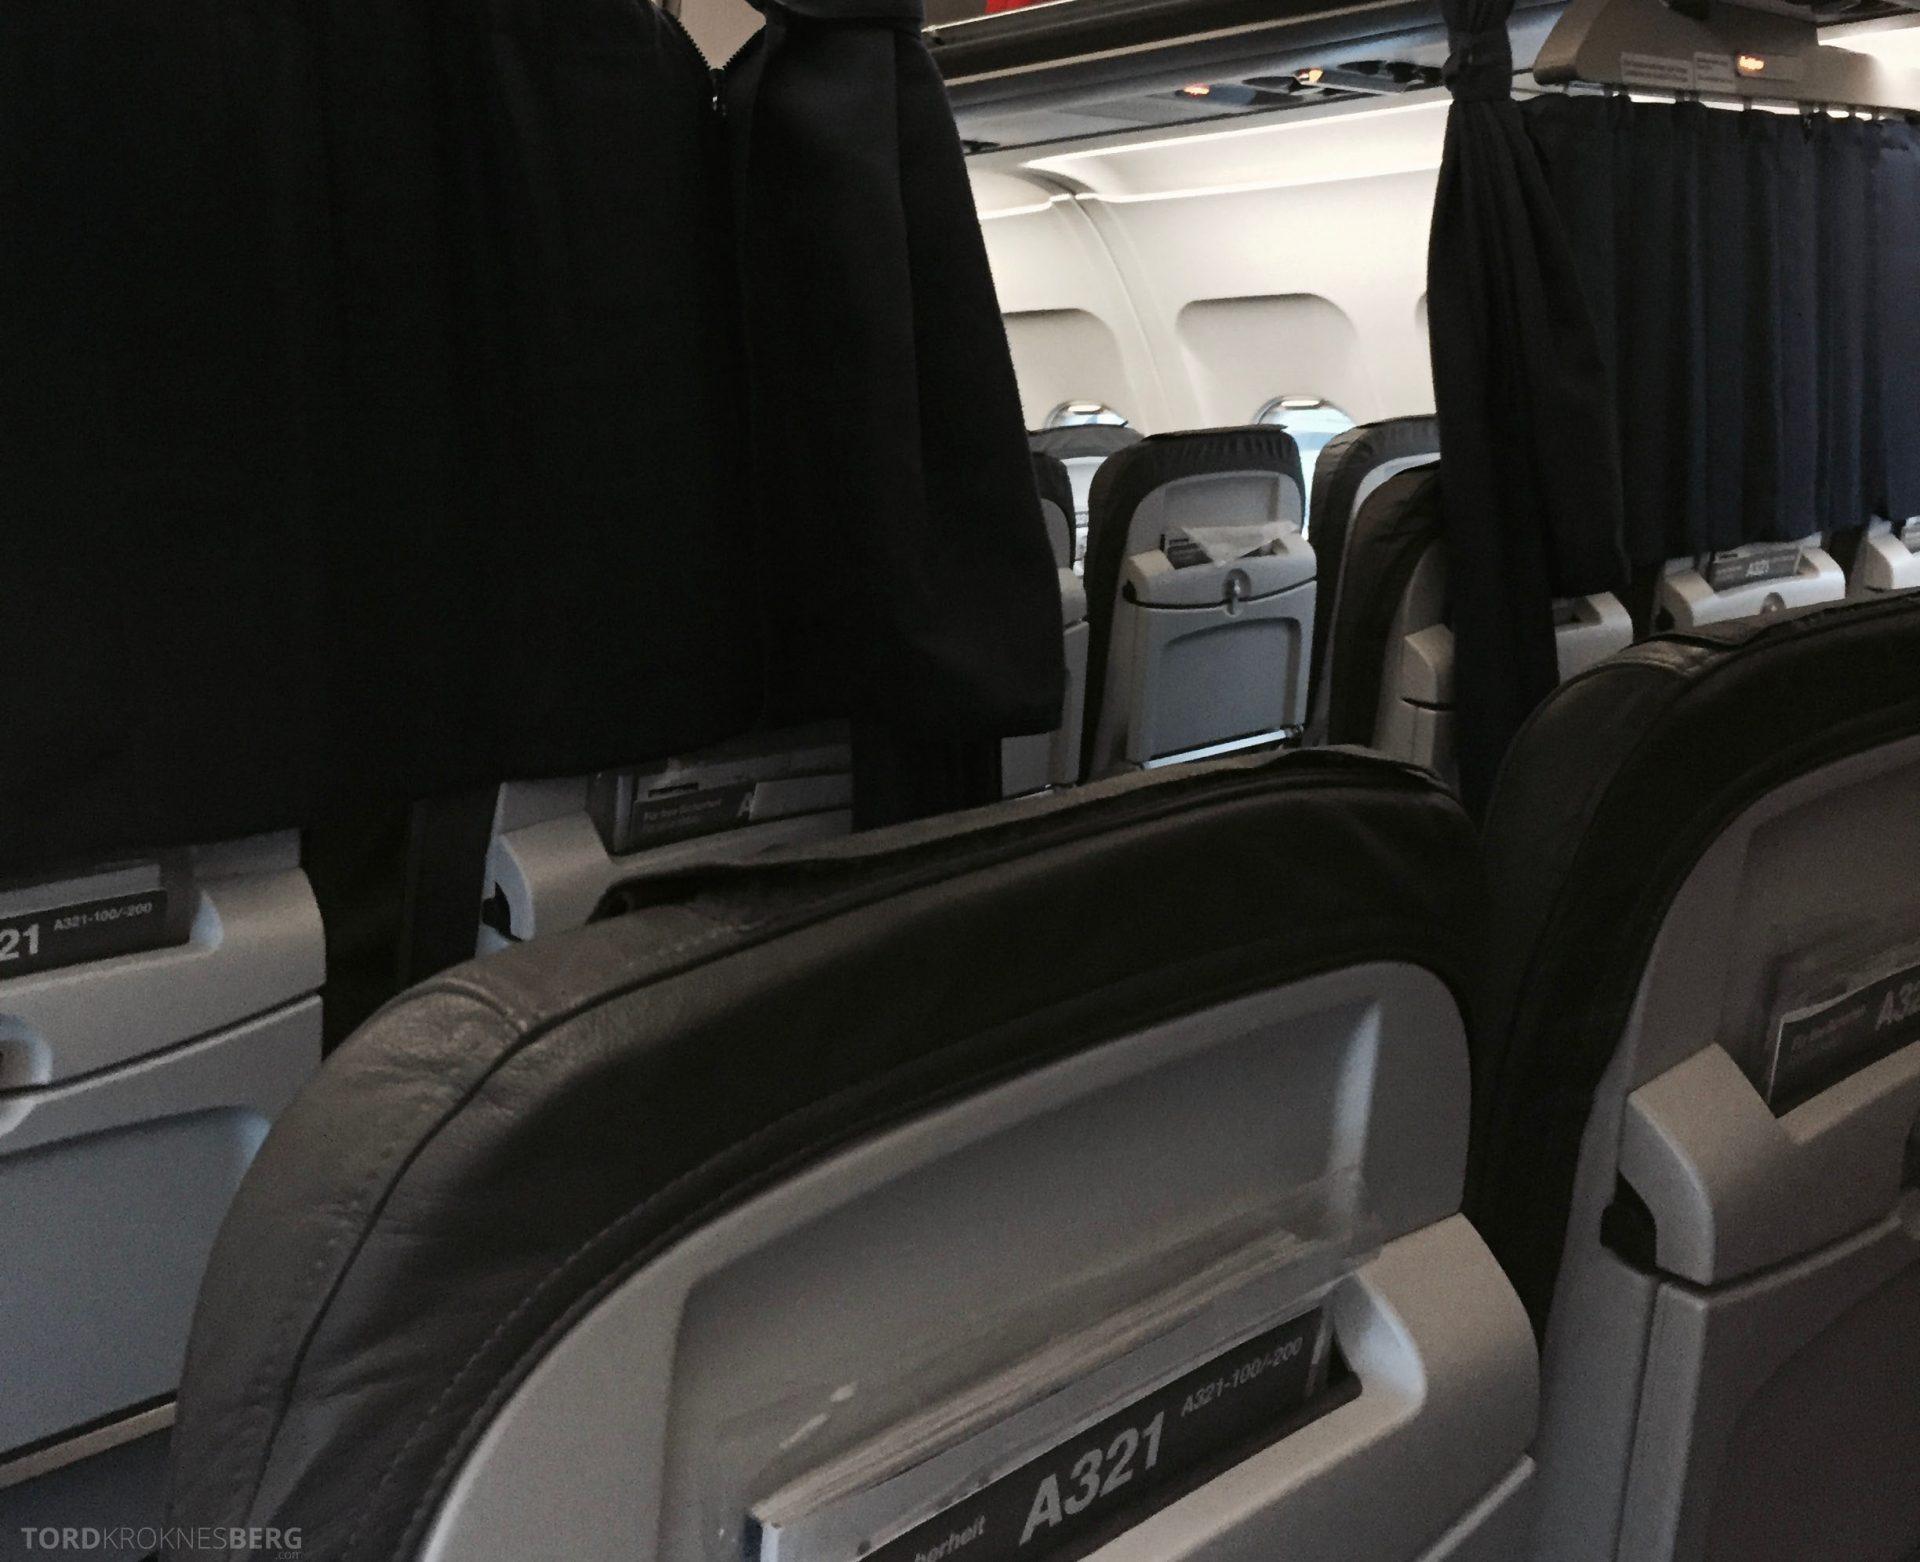 Lufthansa Economy Classic